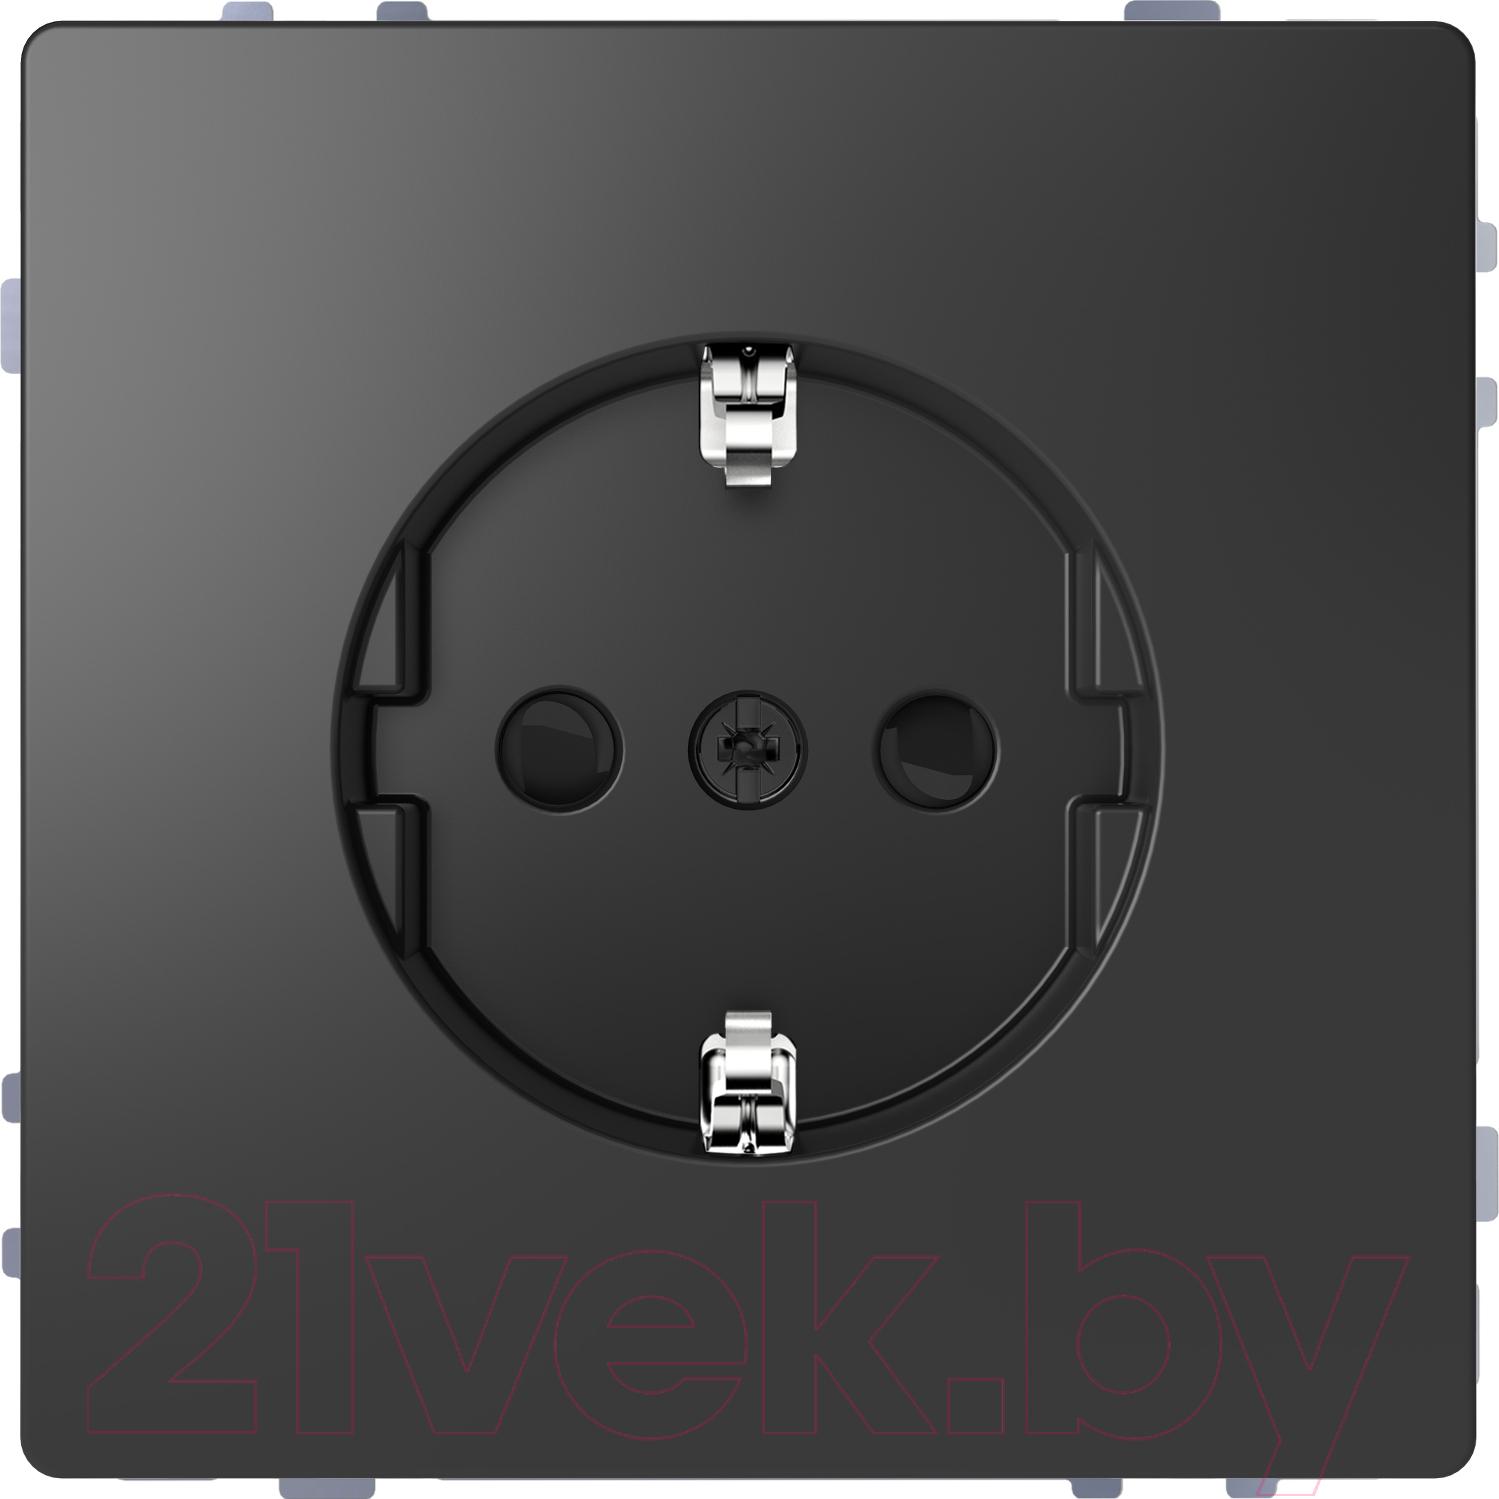 Купить Розетка Schneider Electric, Merten MTN2400-6034, Россия, пластик, Merten D-Life (Schneider Electric)